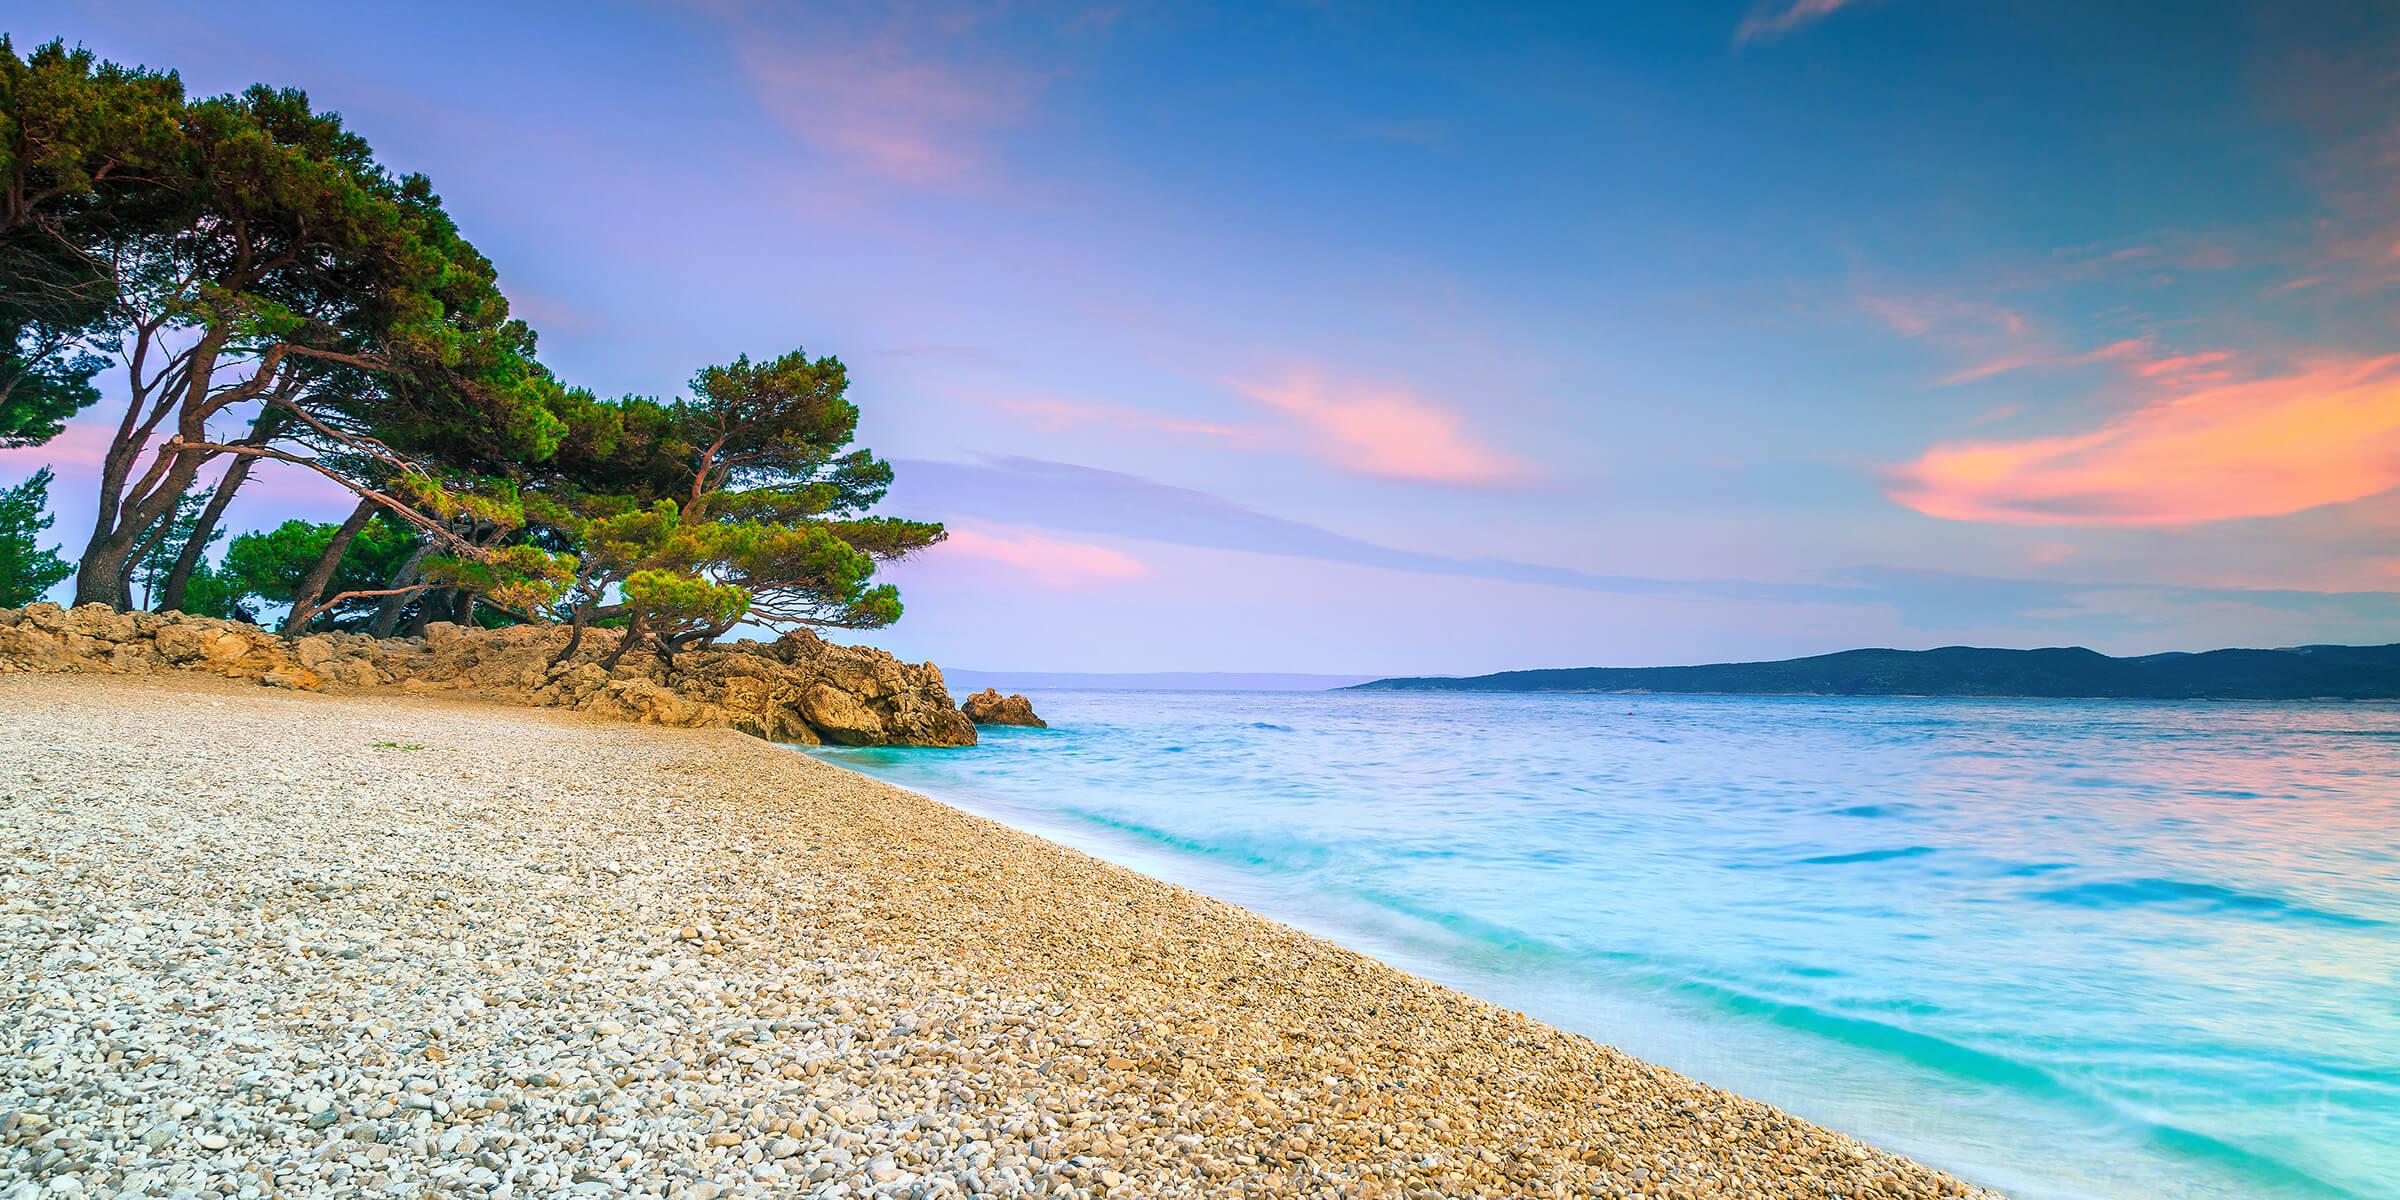 Plaja in Brela